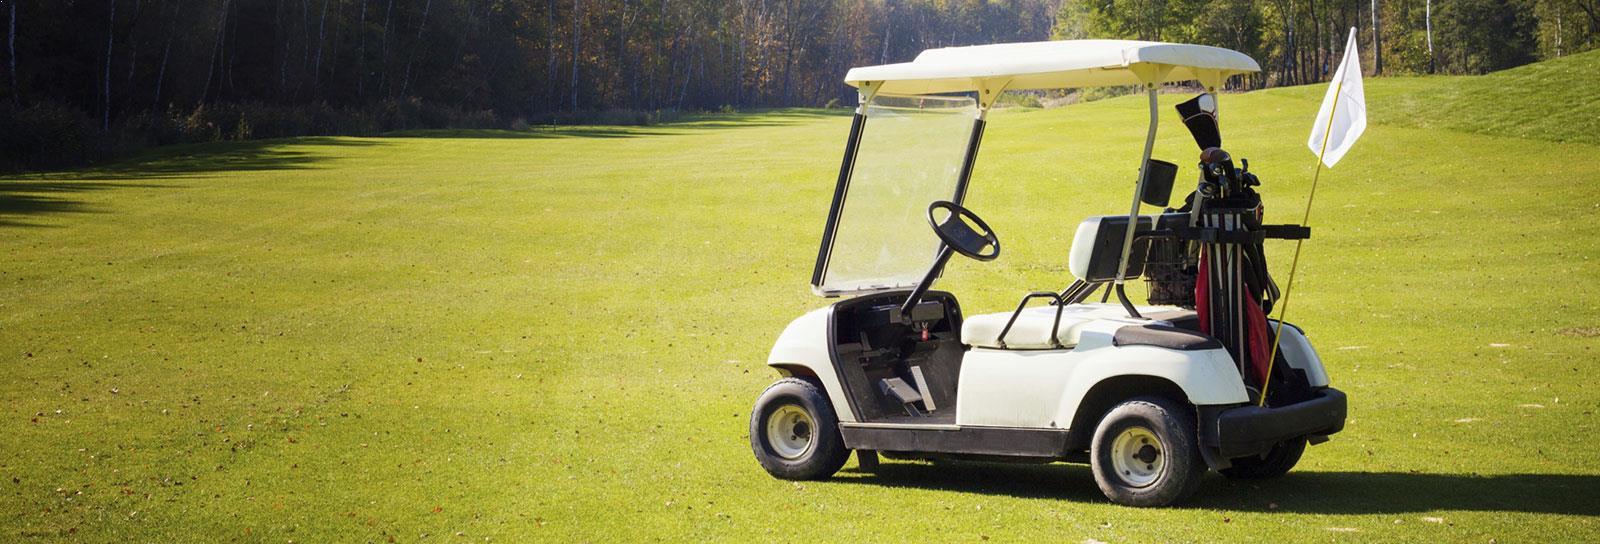 Sunnyvale Sunken Gardens Golf Course